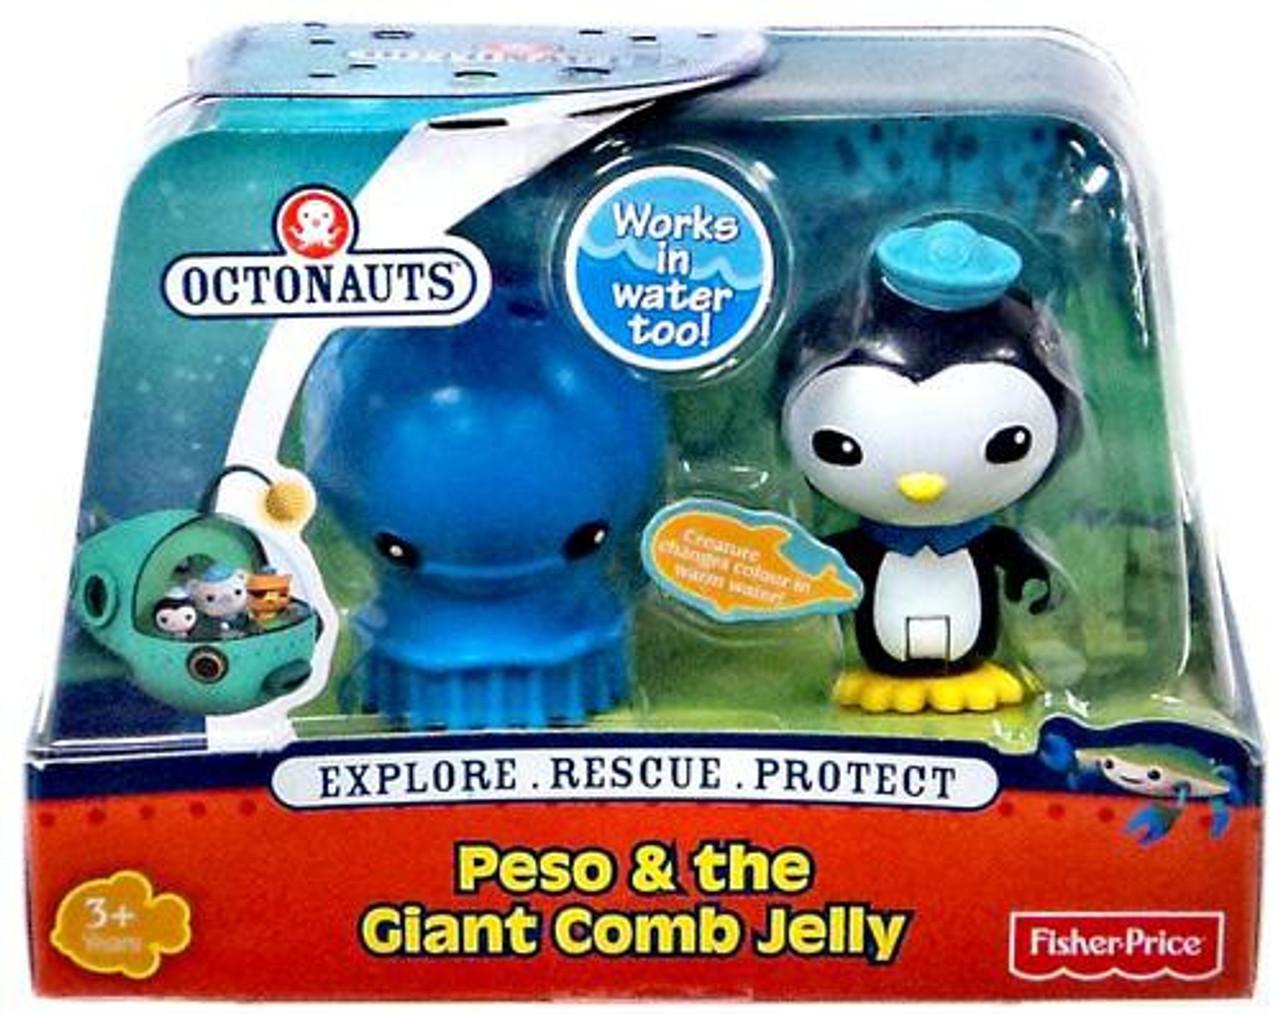 Fisher Price Octonauts Peso & The Giant Comb Jelly Figure Set